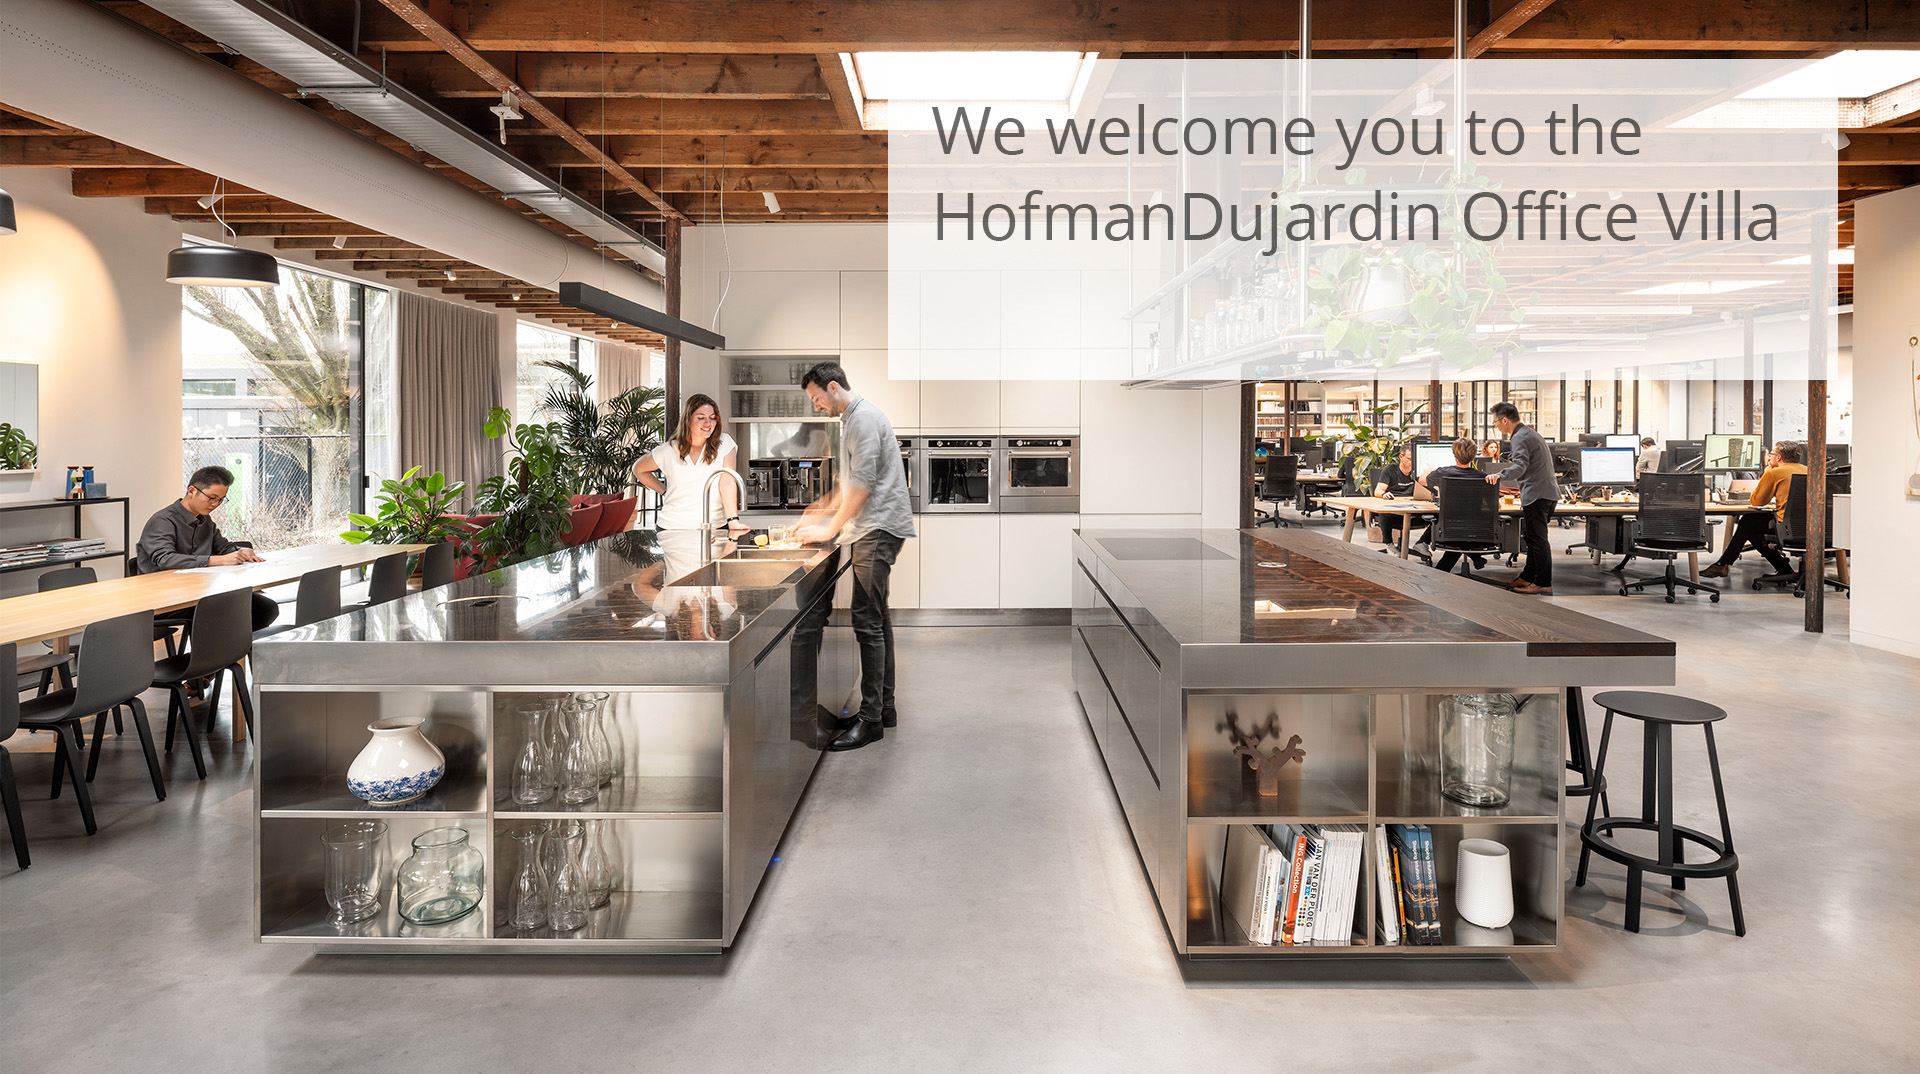 HofmanDujardin Office villa